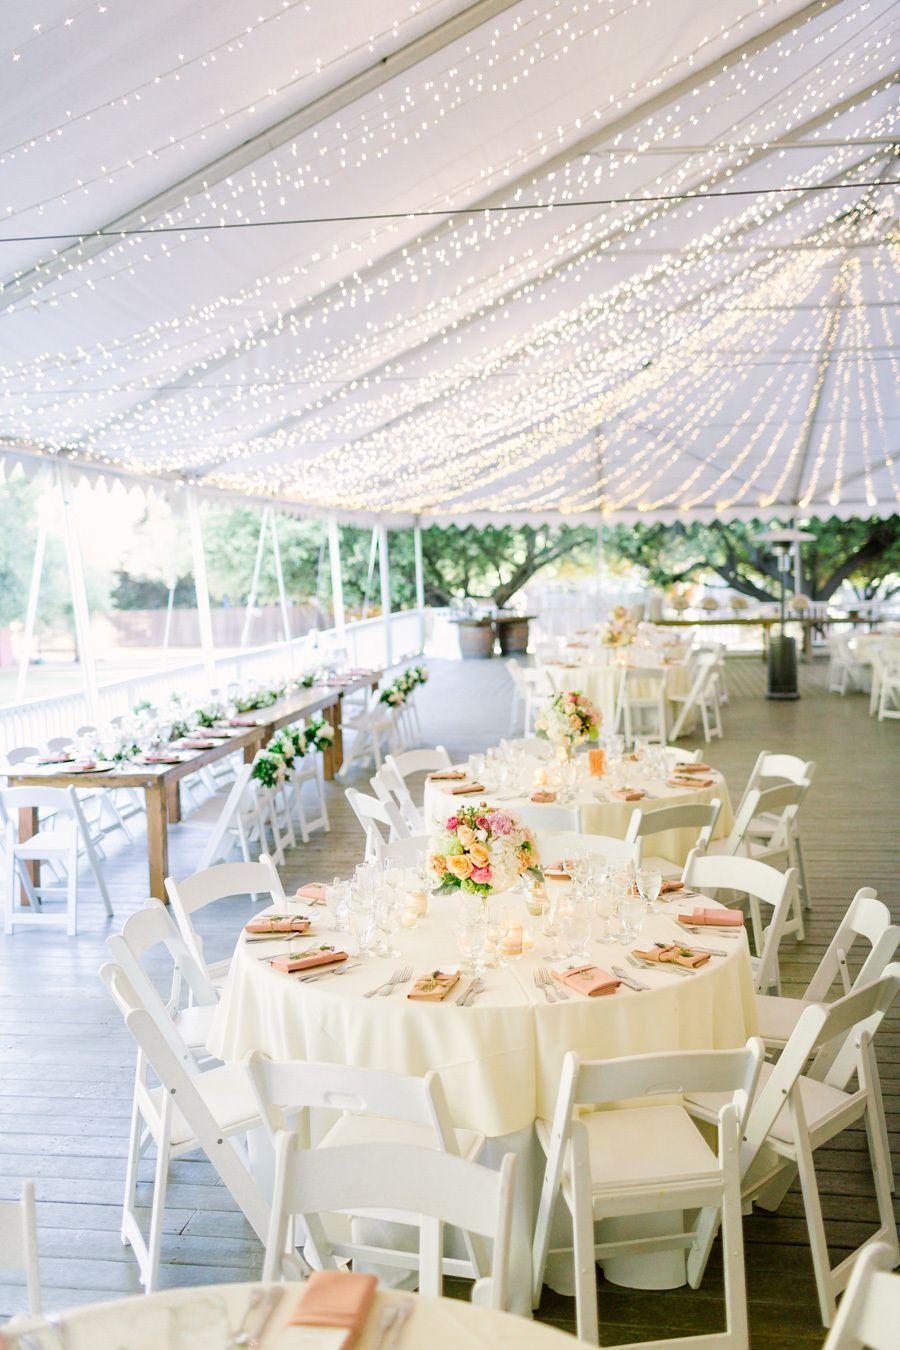 Wedding tent decoration images  Romantic Summer Wedding at Calamigos Ranch  Reception Weddings and